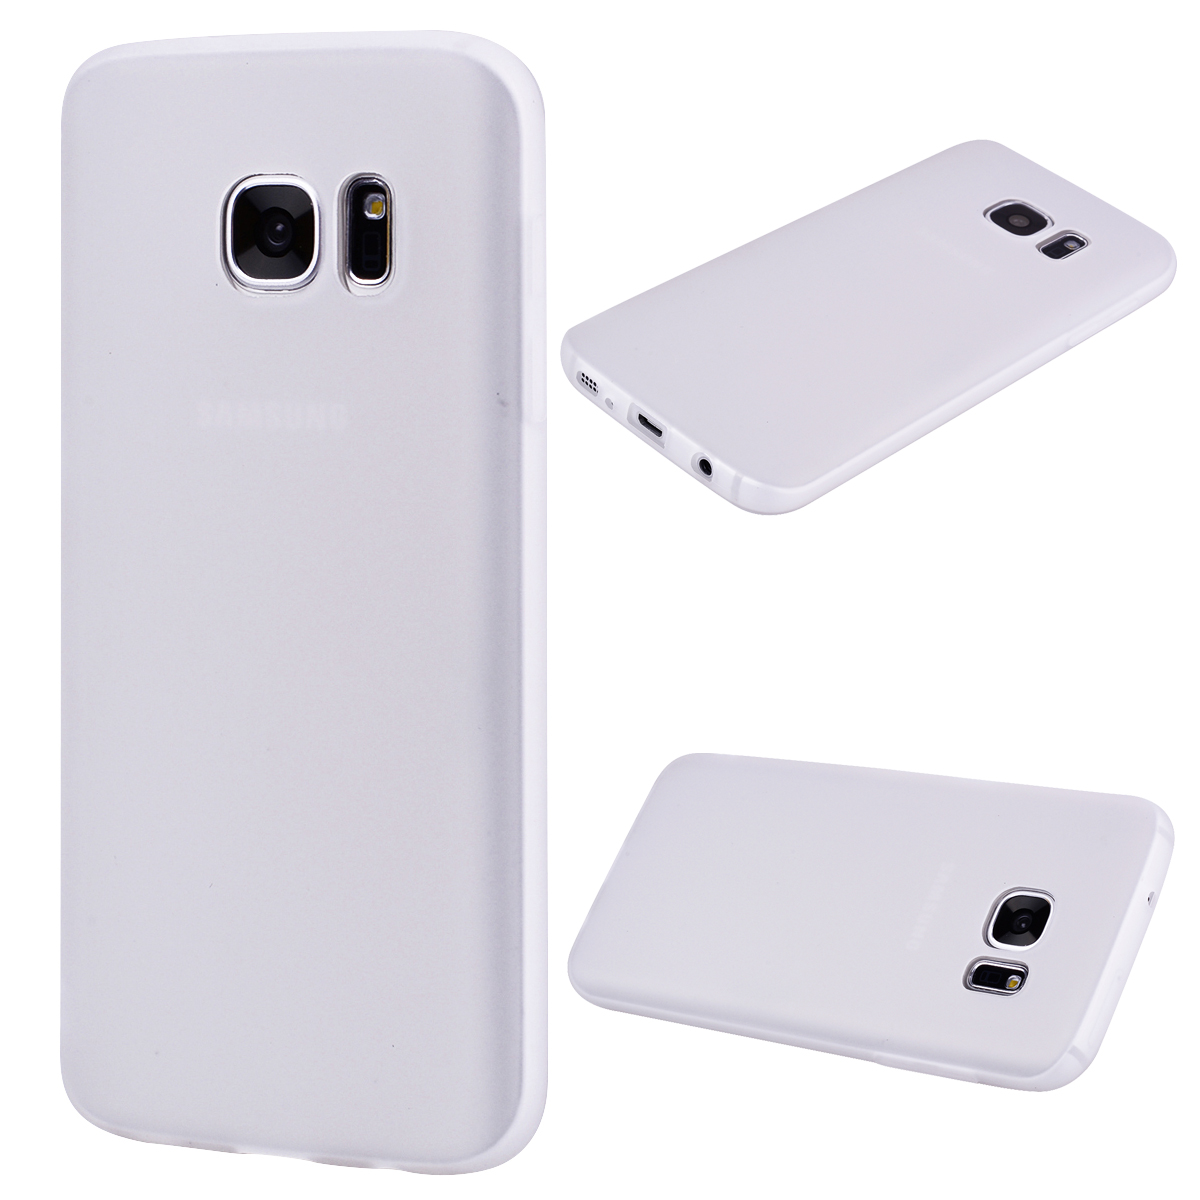 for Samsung S7 Cute Candy Color Matte TPU Anti-scratch Non-slip Protective Cover Back Case white